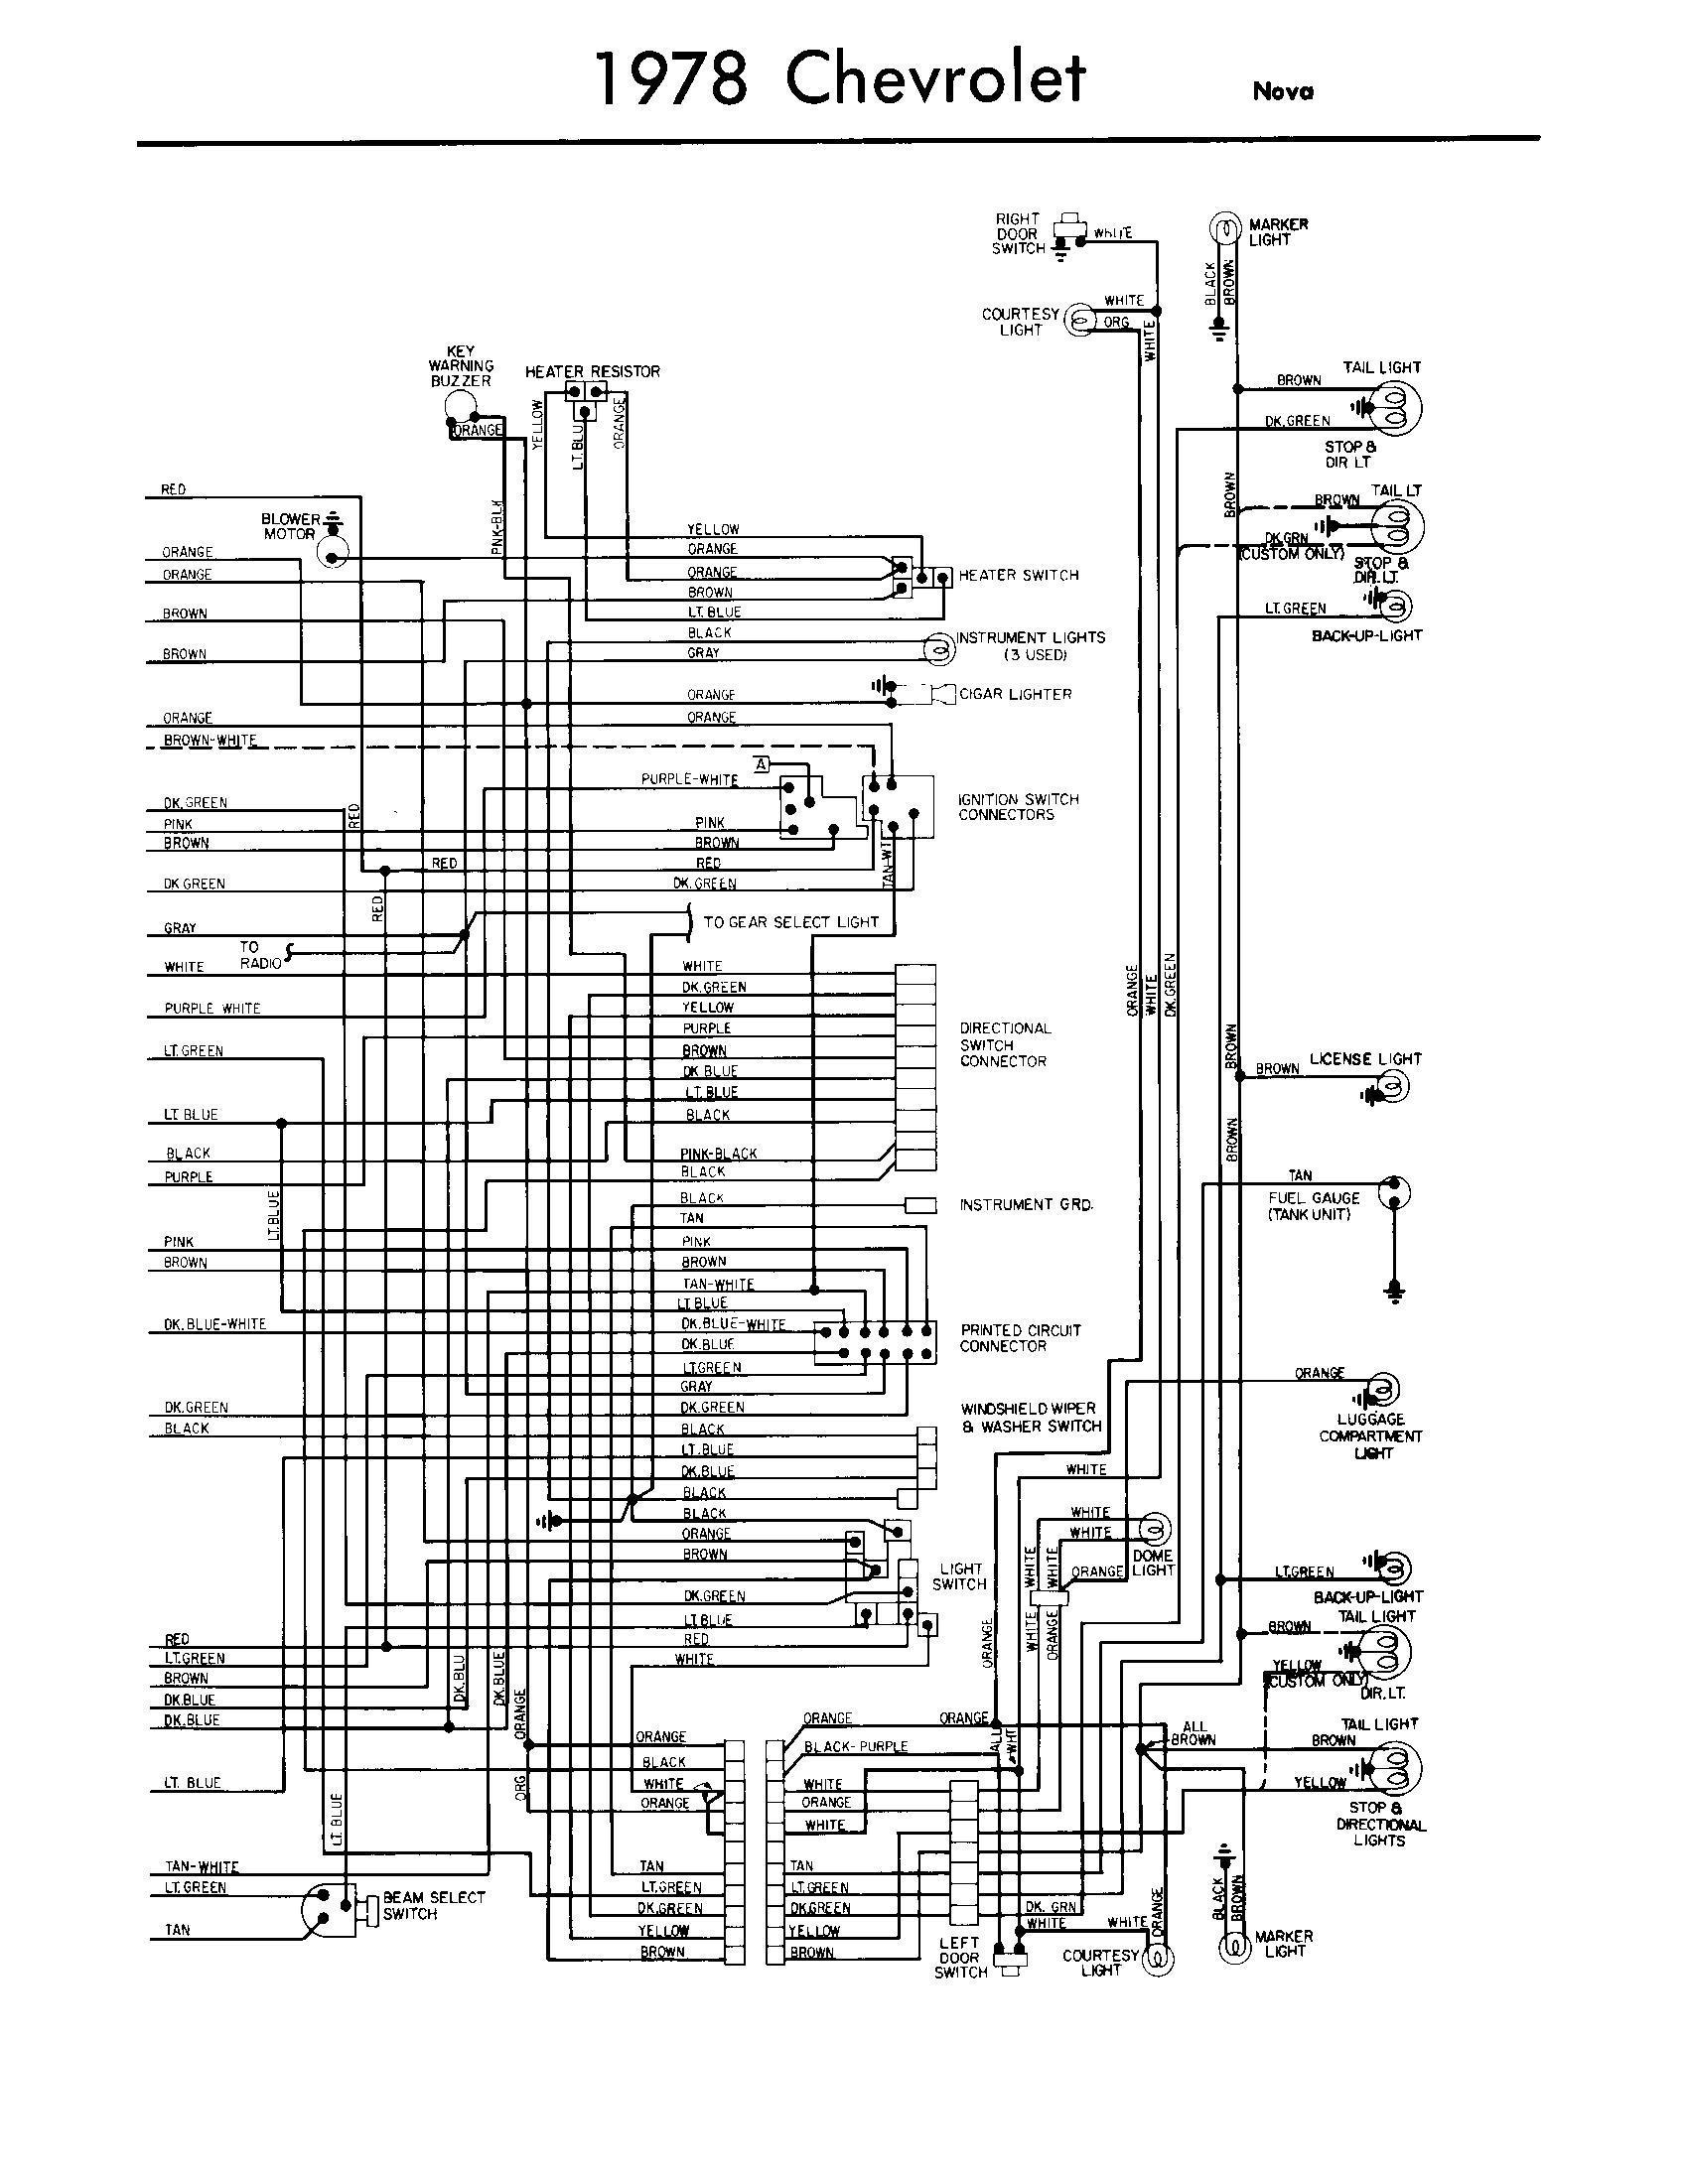 DR_4641] Wiring Diagram For Chevy Luv Wiring DiagramLibrar Wiring 101